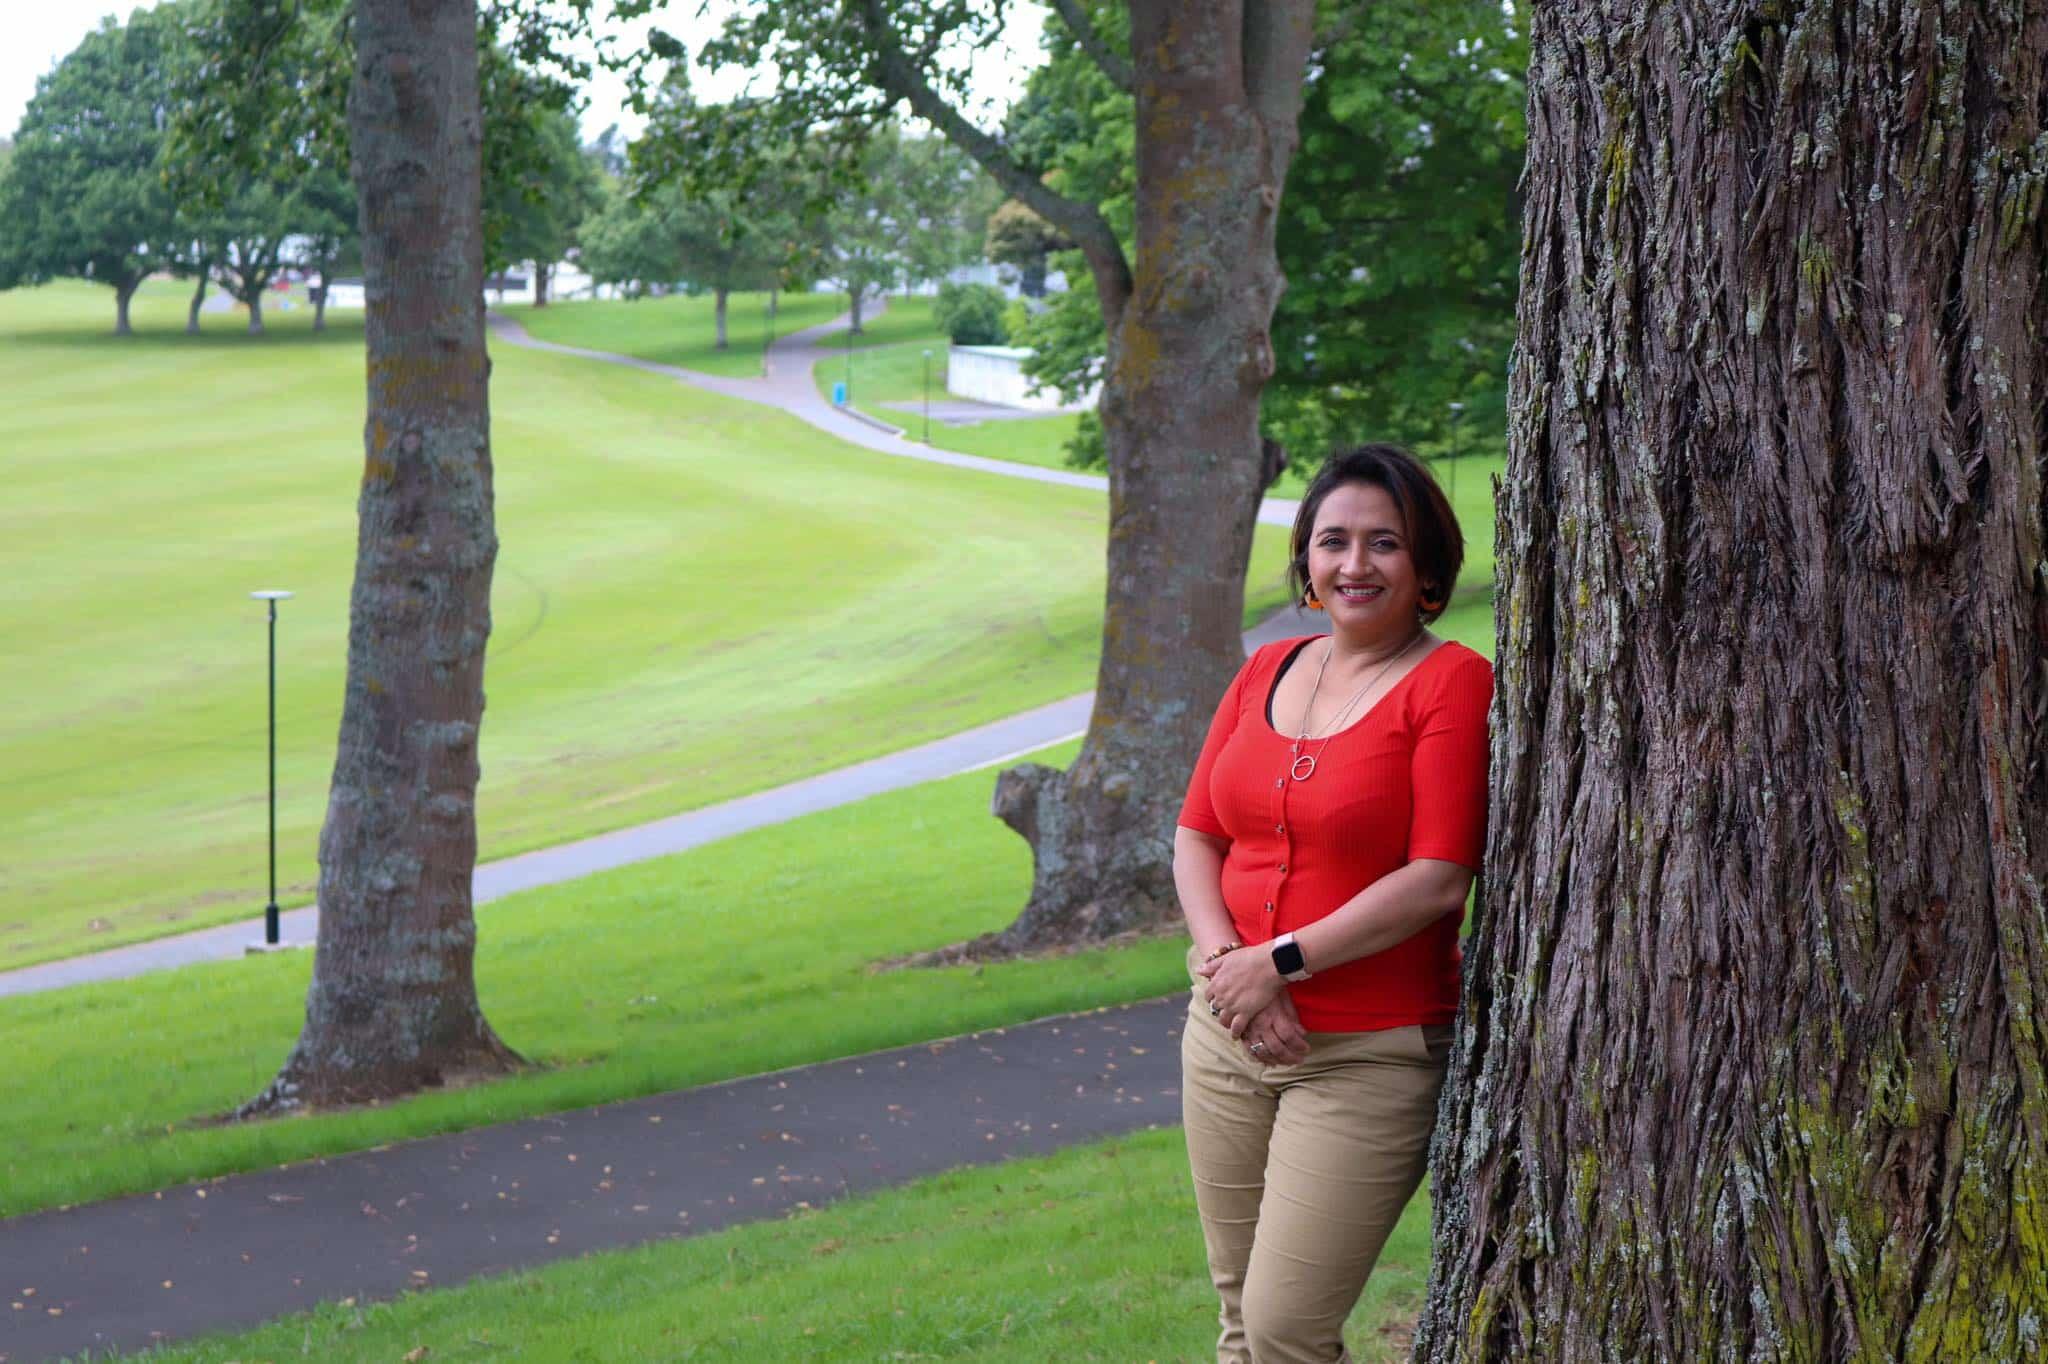 Pratishtha standing outdoors in Waikato New Zealand